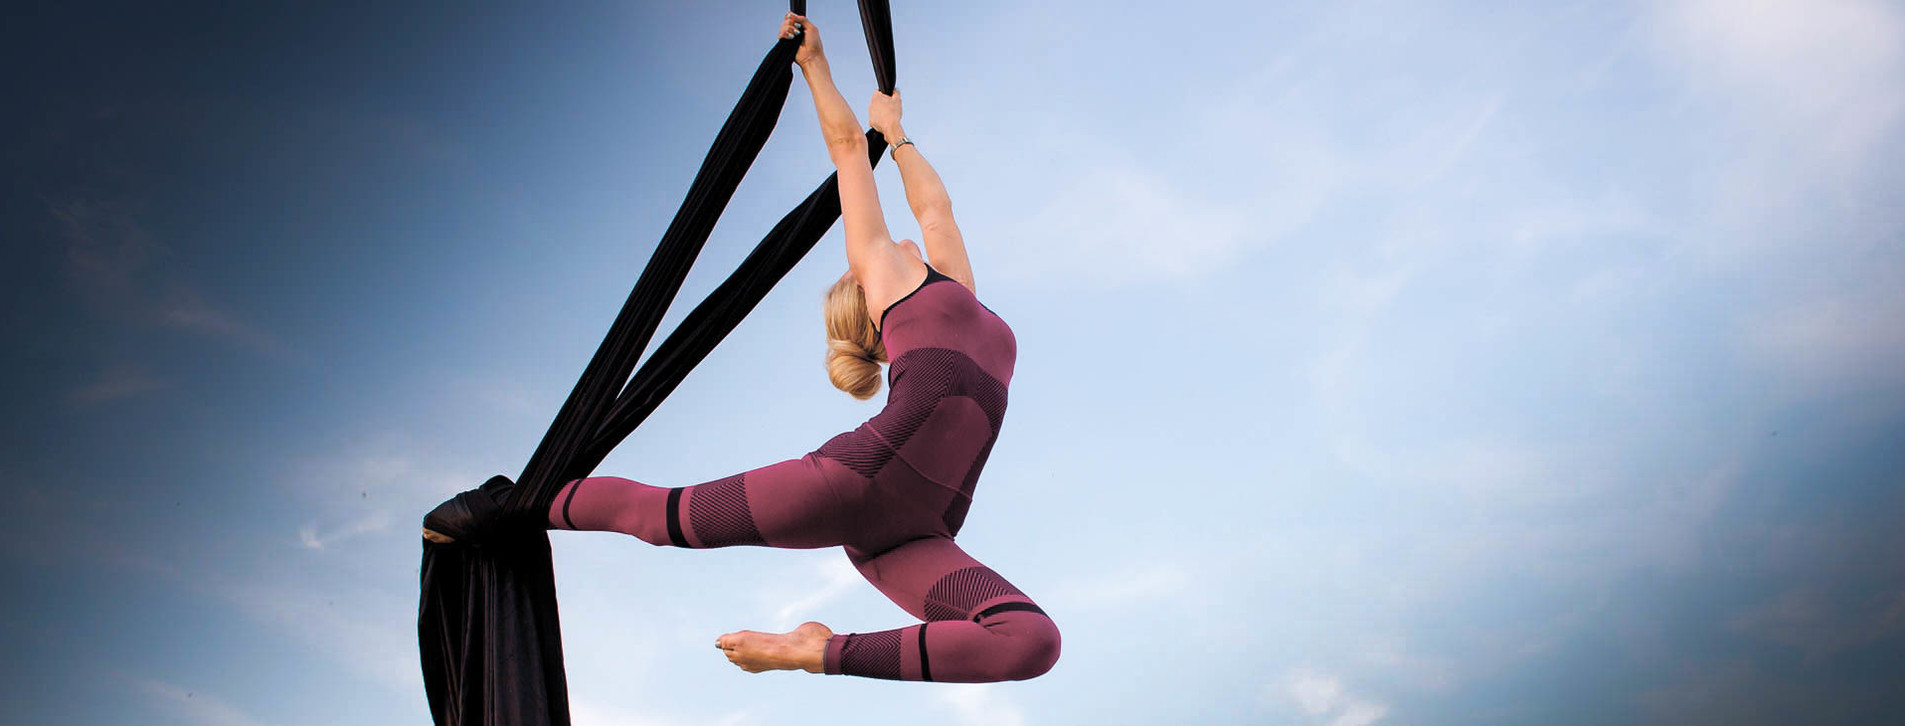 Фото 1 - Воздушная гимнастика на полотнах